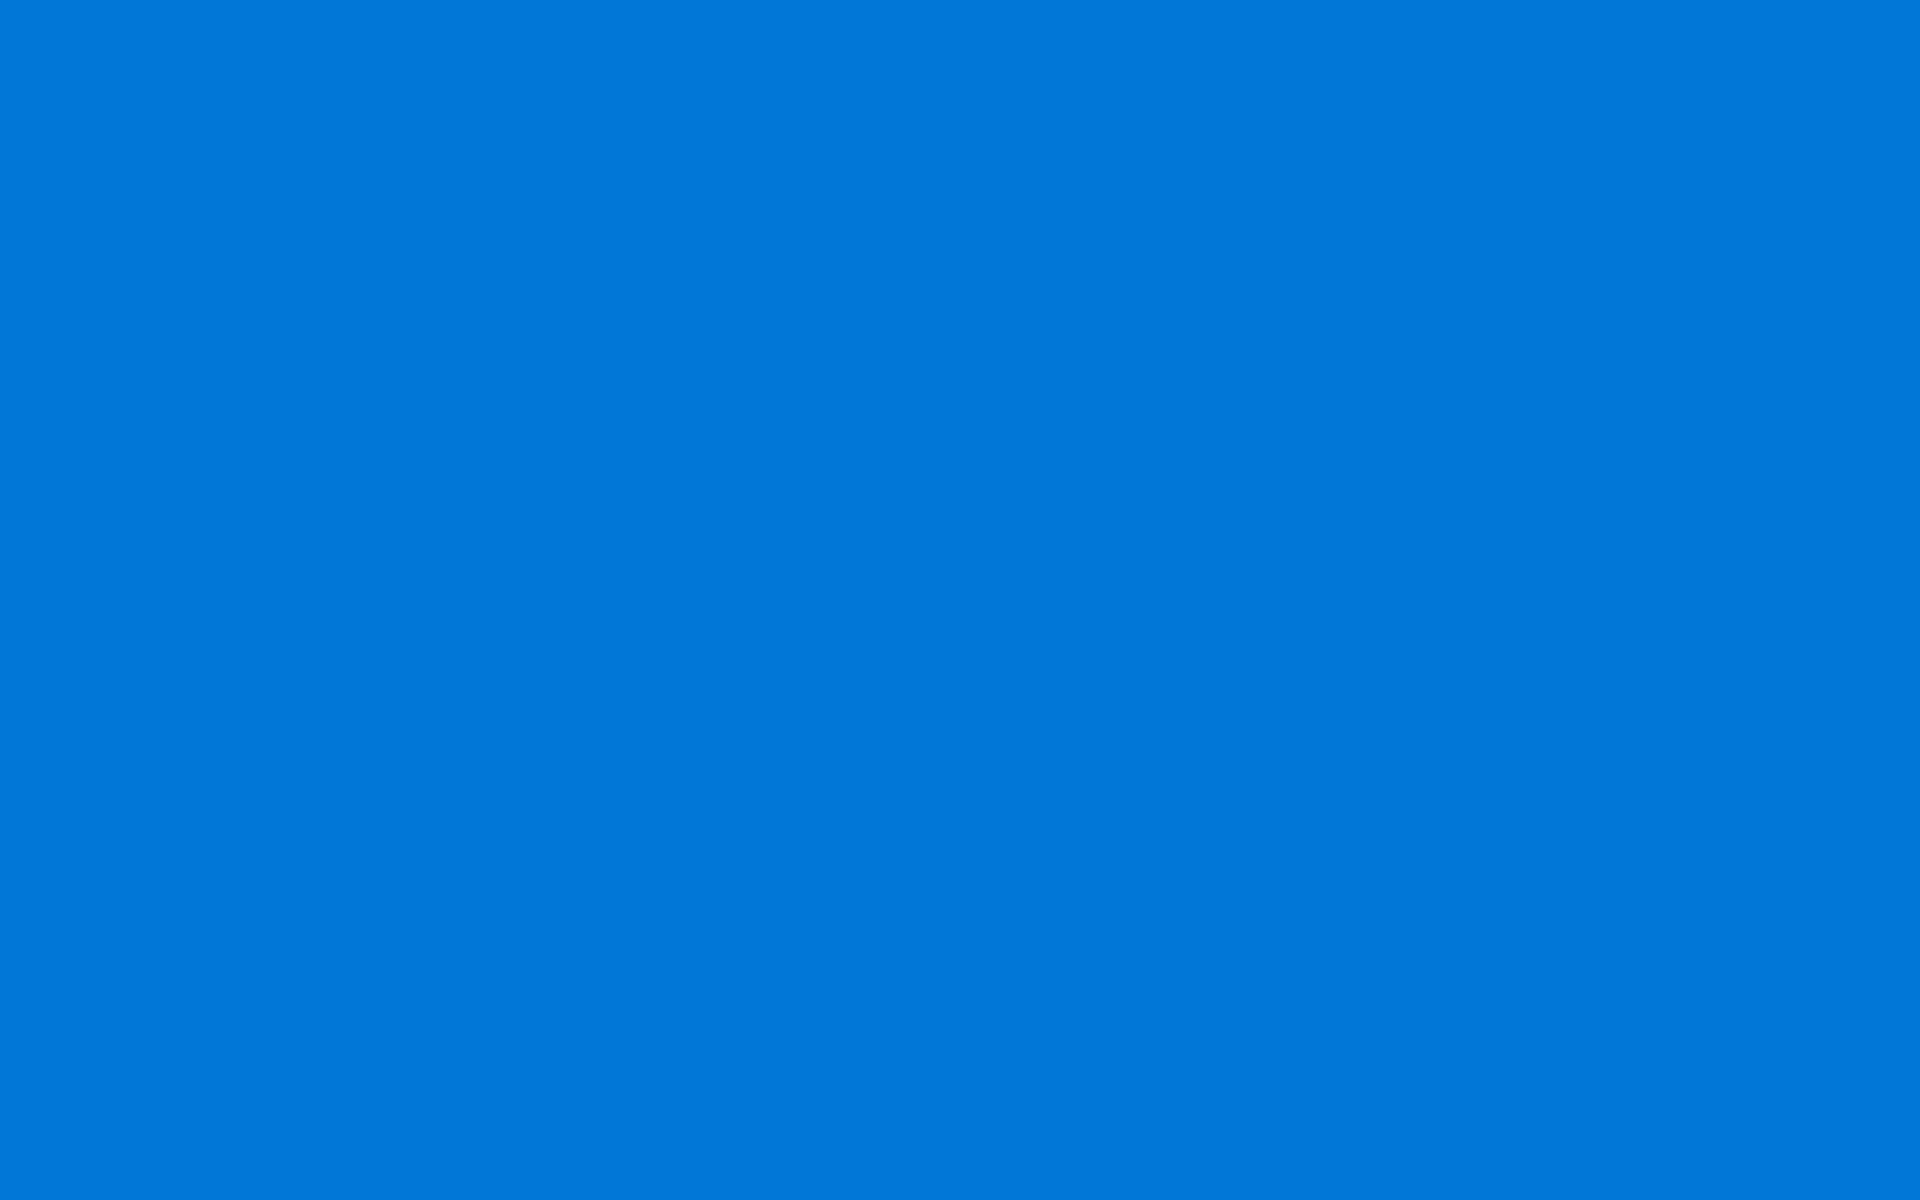 50+] Change Default Wallpaper Windows 10 on WallpaperSafari